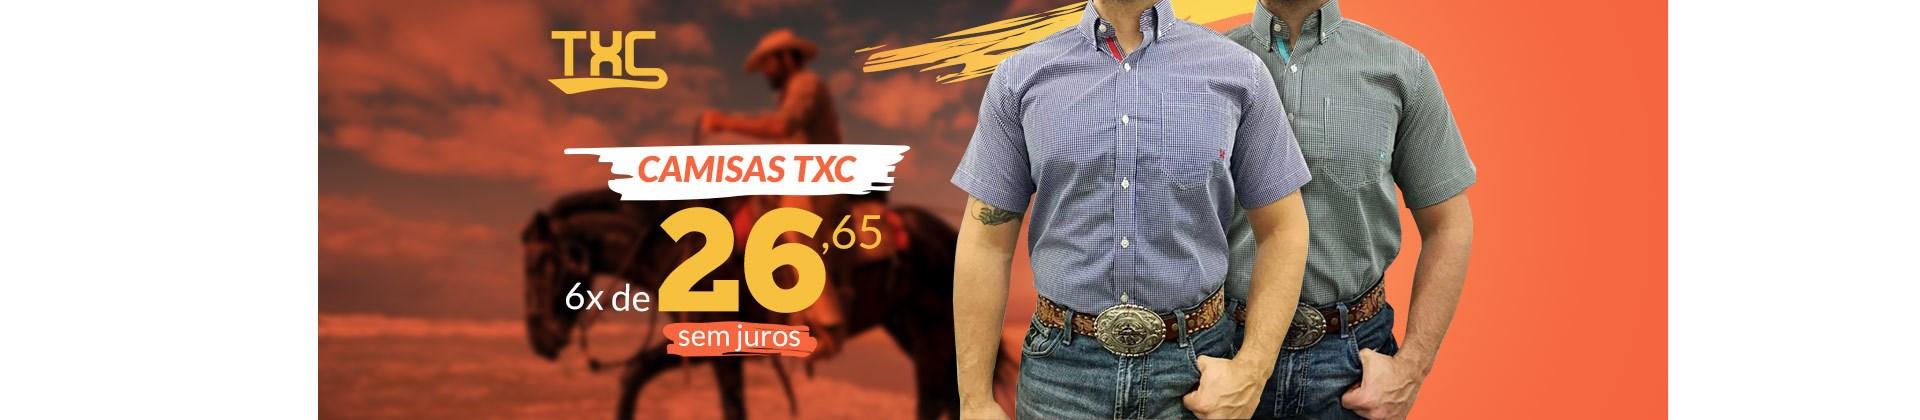 Banner Destaque Camisa TXC - Fevereiro